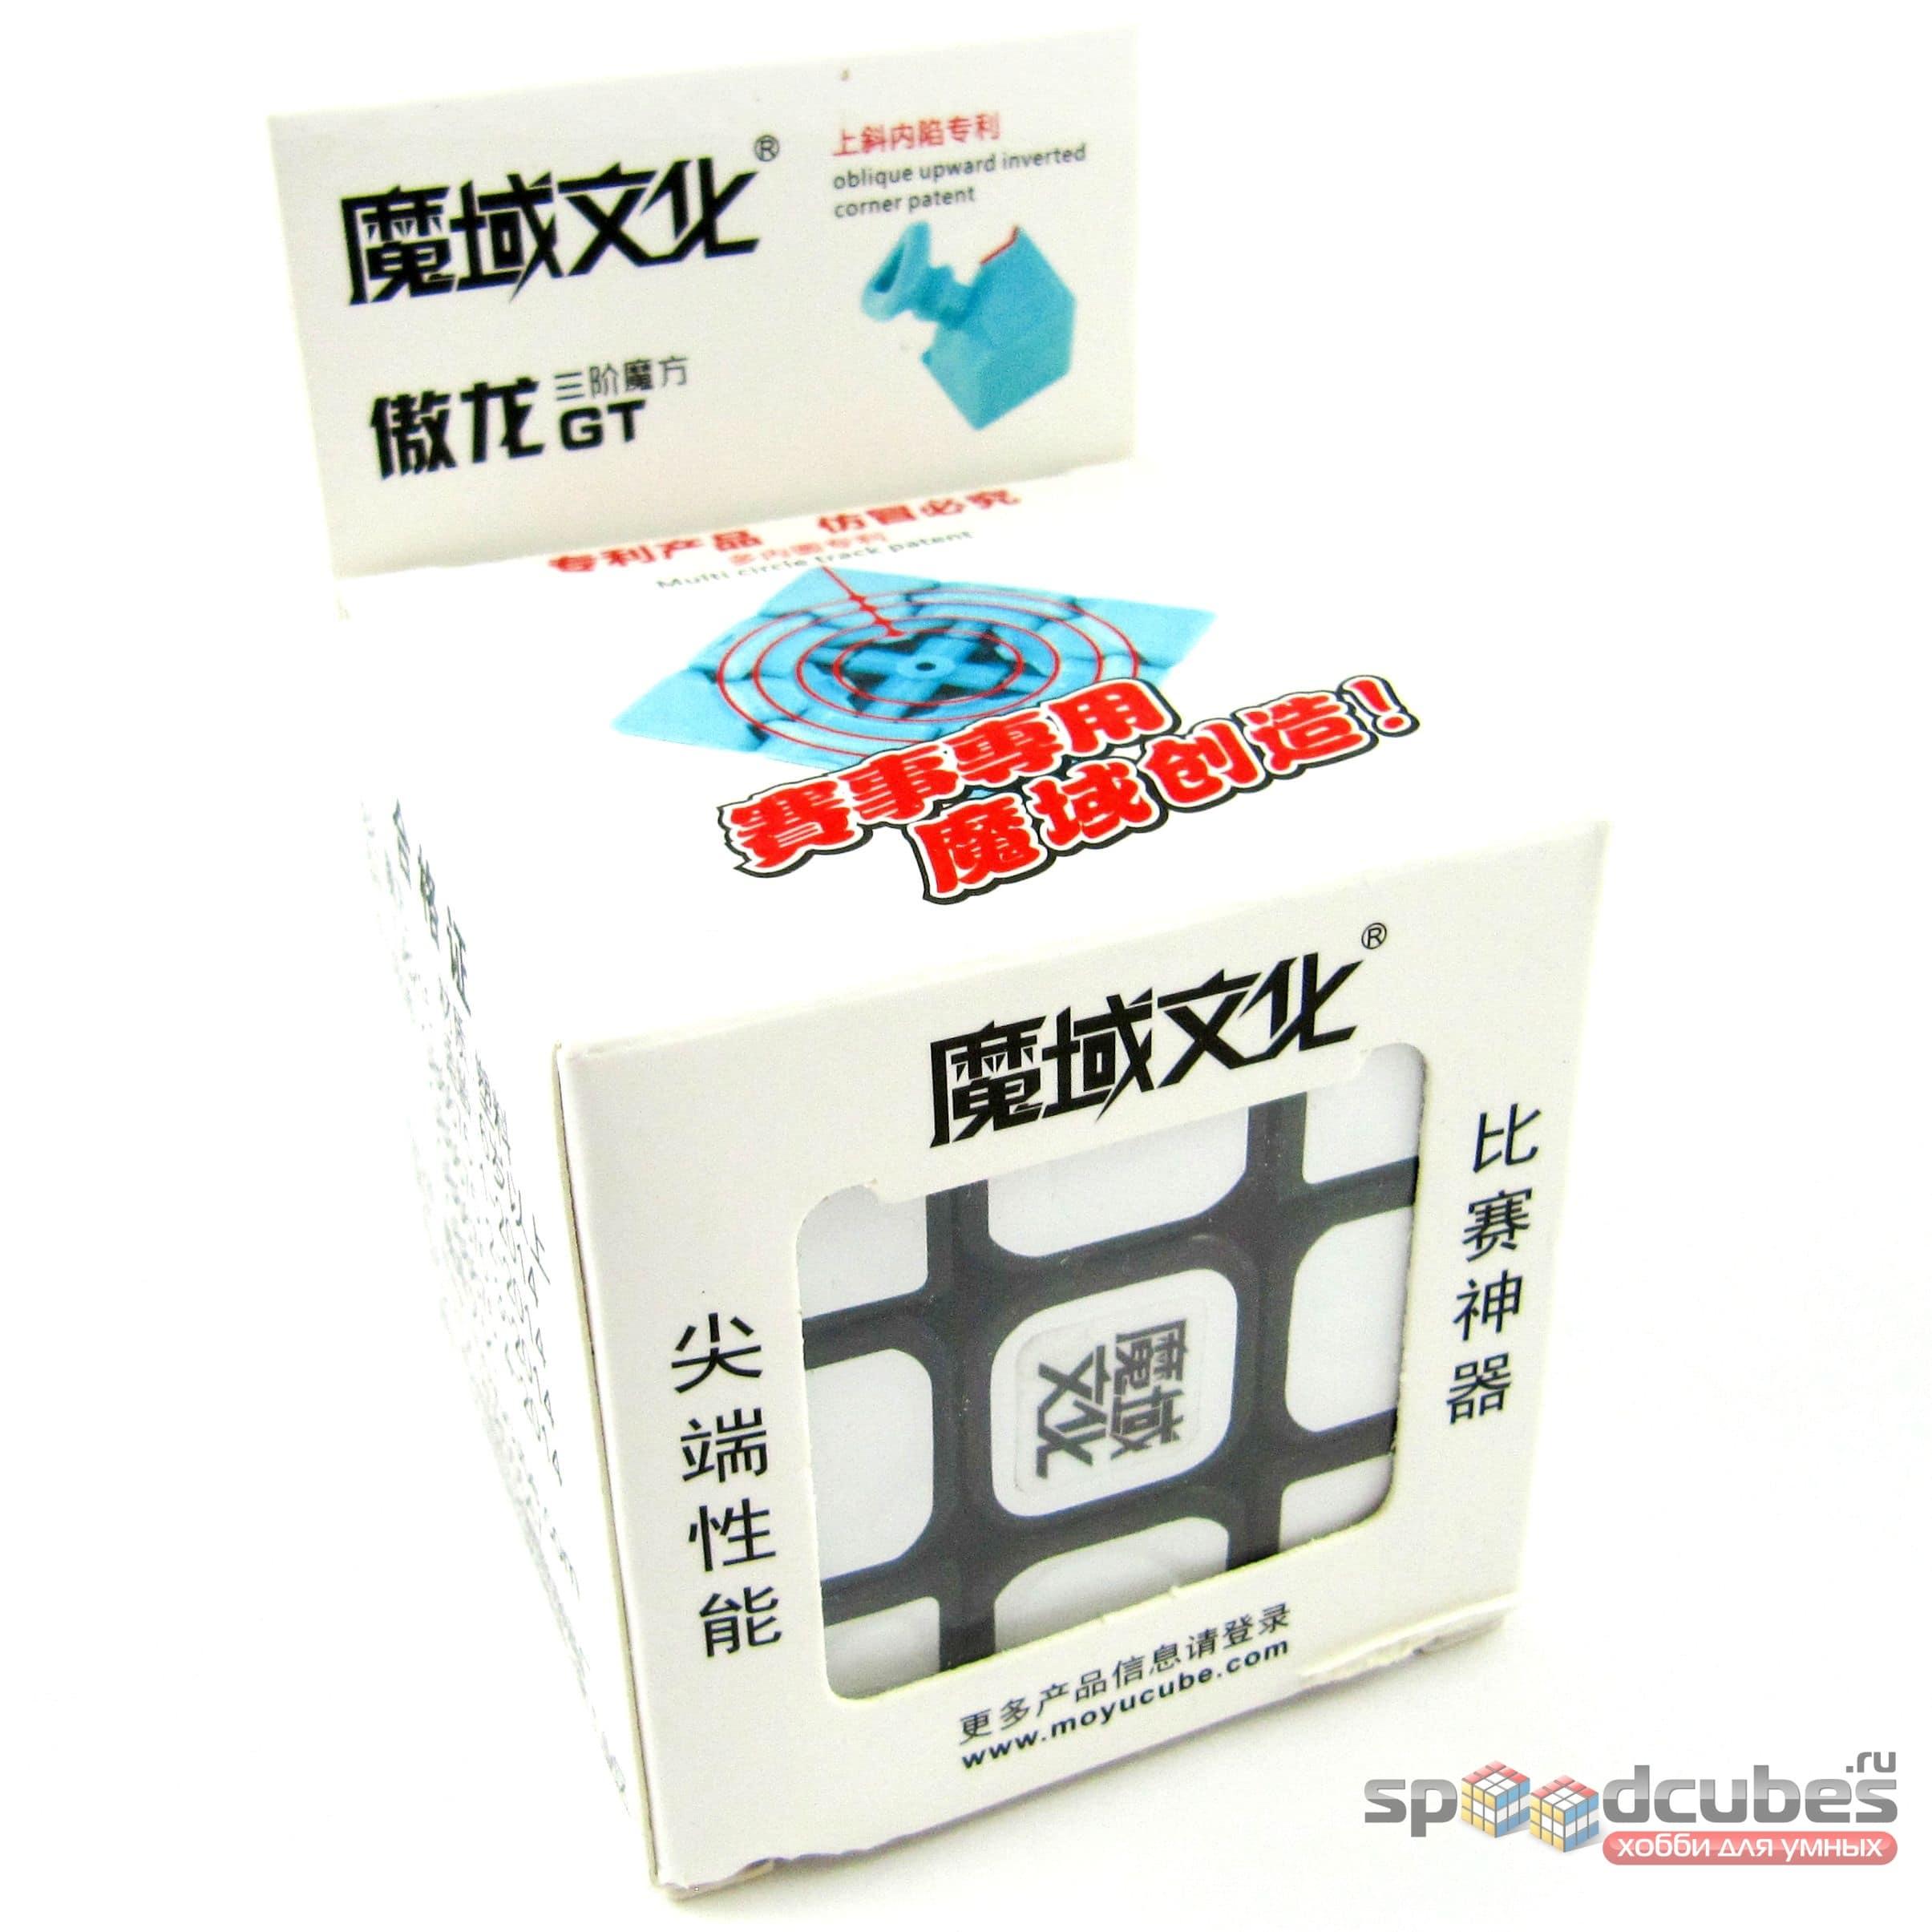 MoYu 3x3x3 Aolong GT